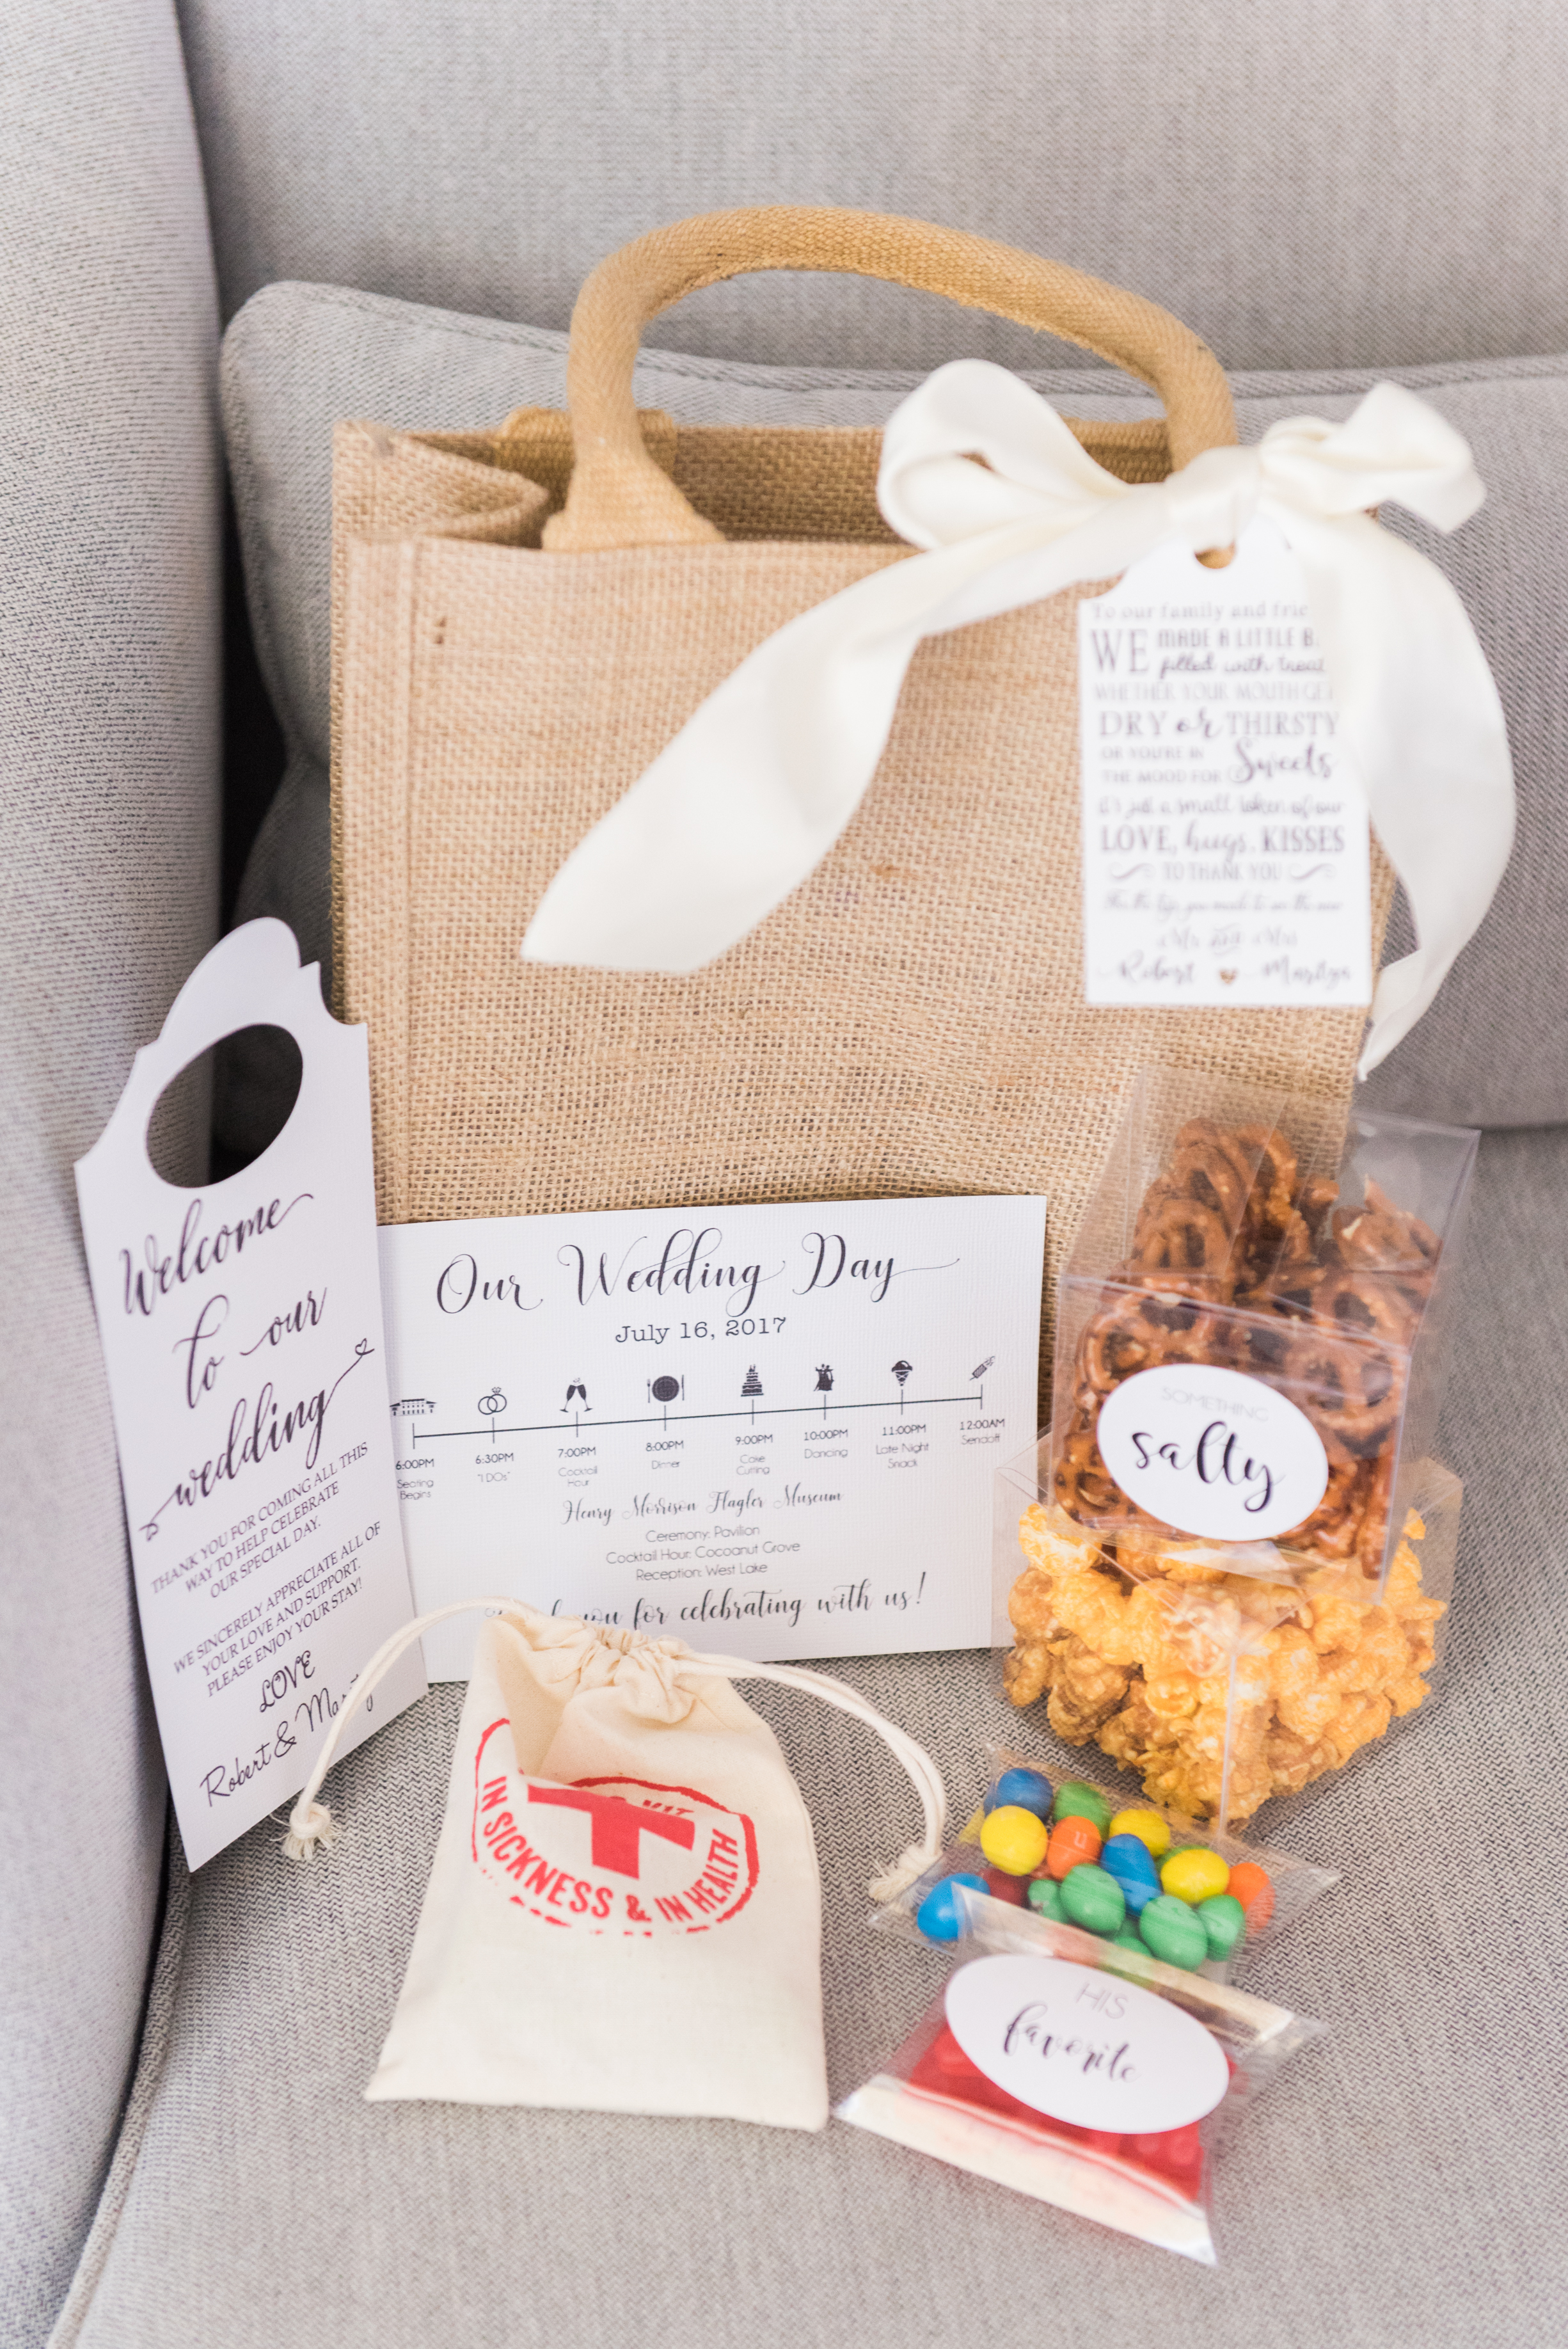 Bridesmaid Gift Ideas - Flagler Museum Palm Beach Wedding Venue - The Overwhelmed Bride Wedding Blog